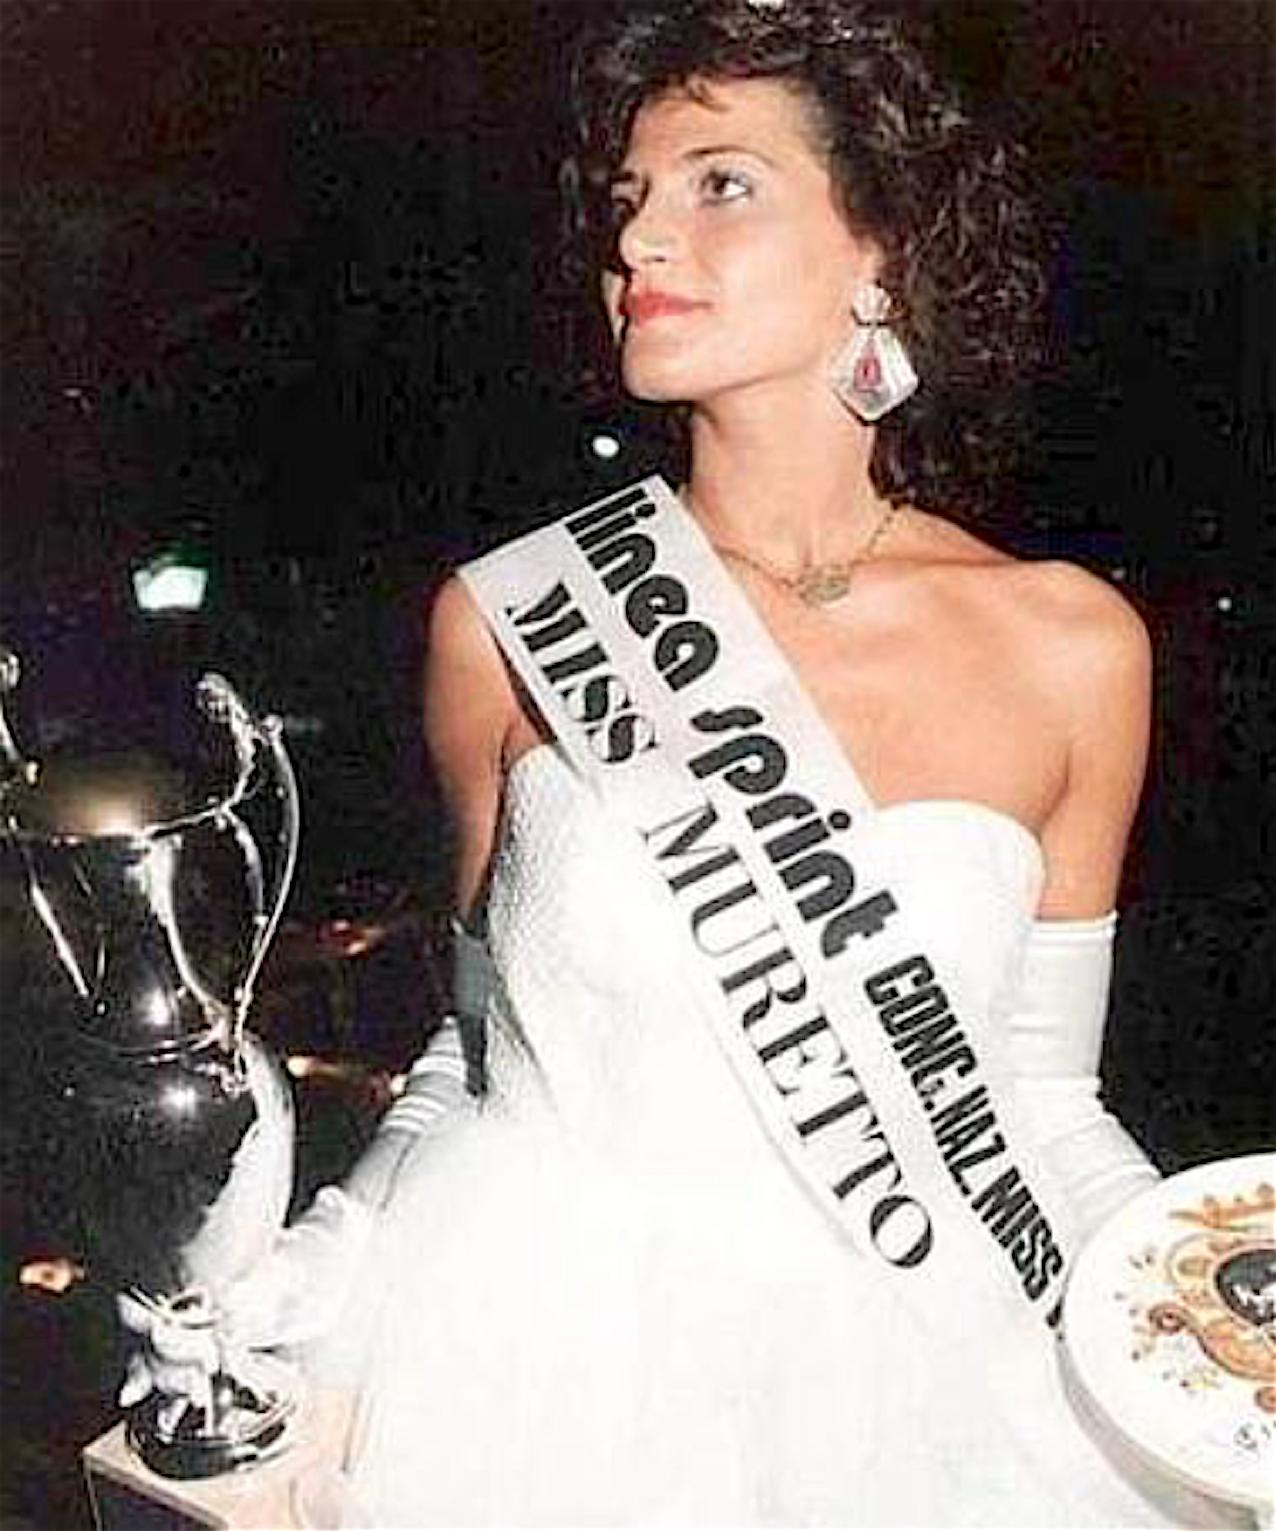 simona_ventutra_giovane_miss_muretto_1986